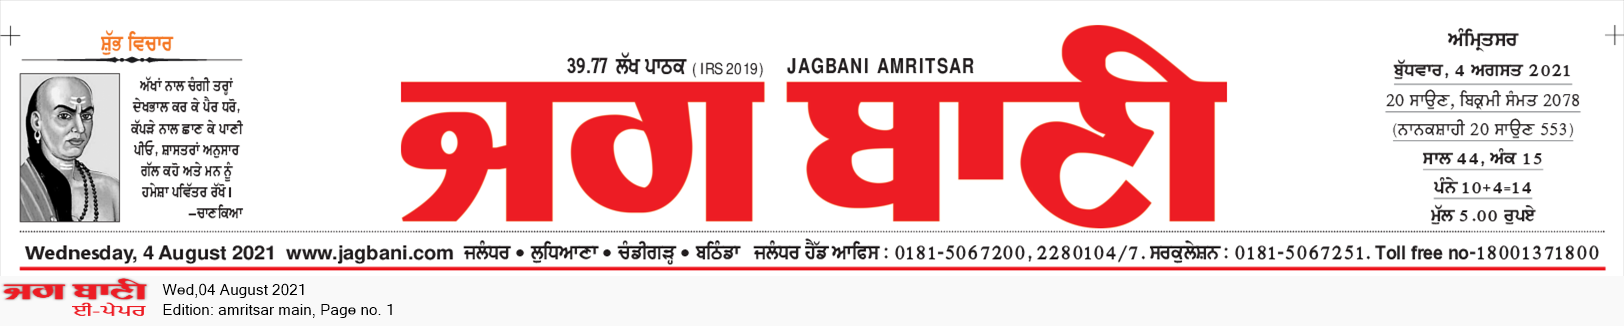 Amritsar Main 8/4/2021 12:00:00 AM